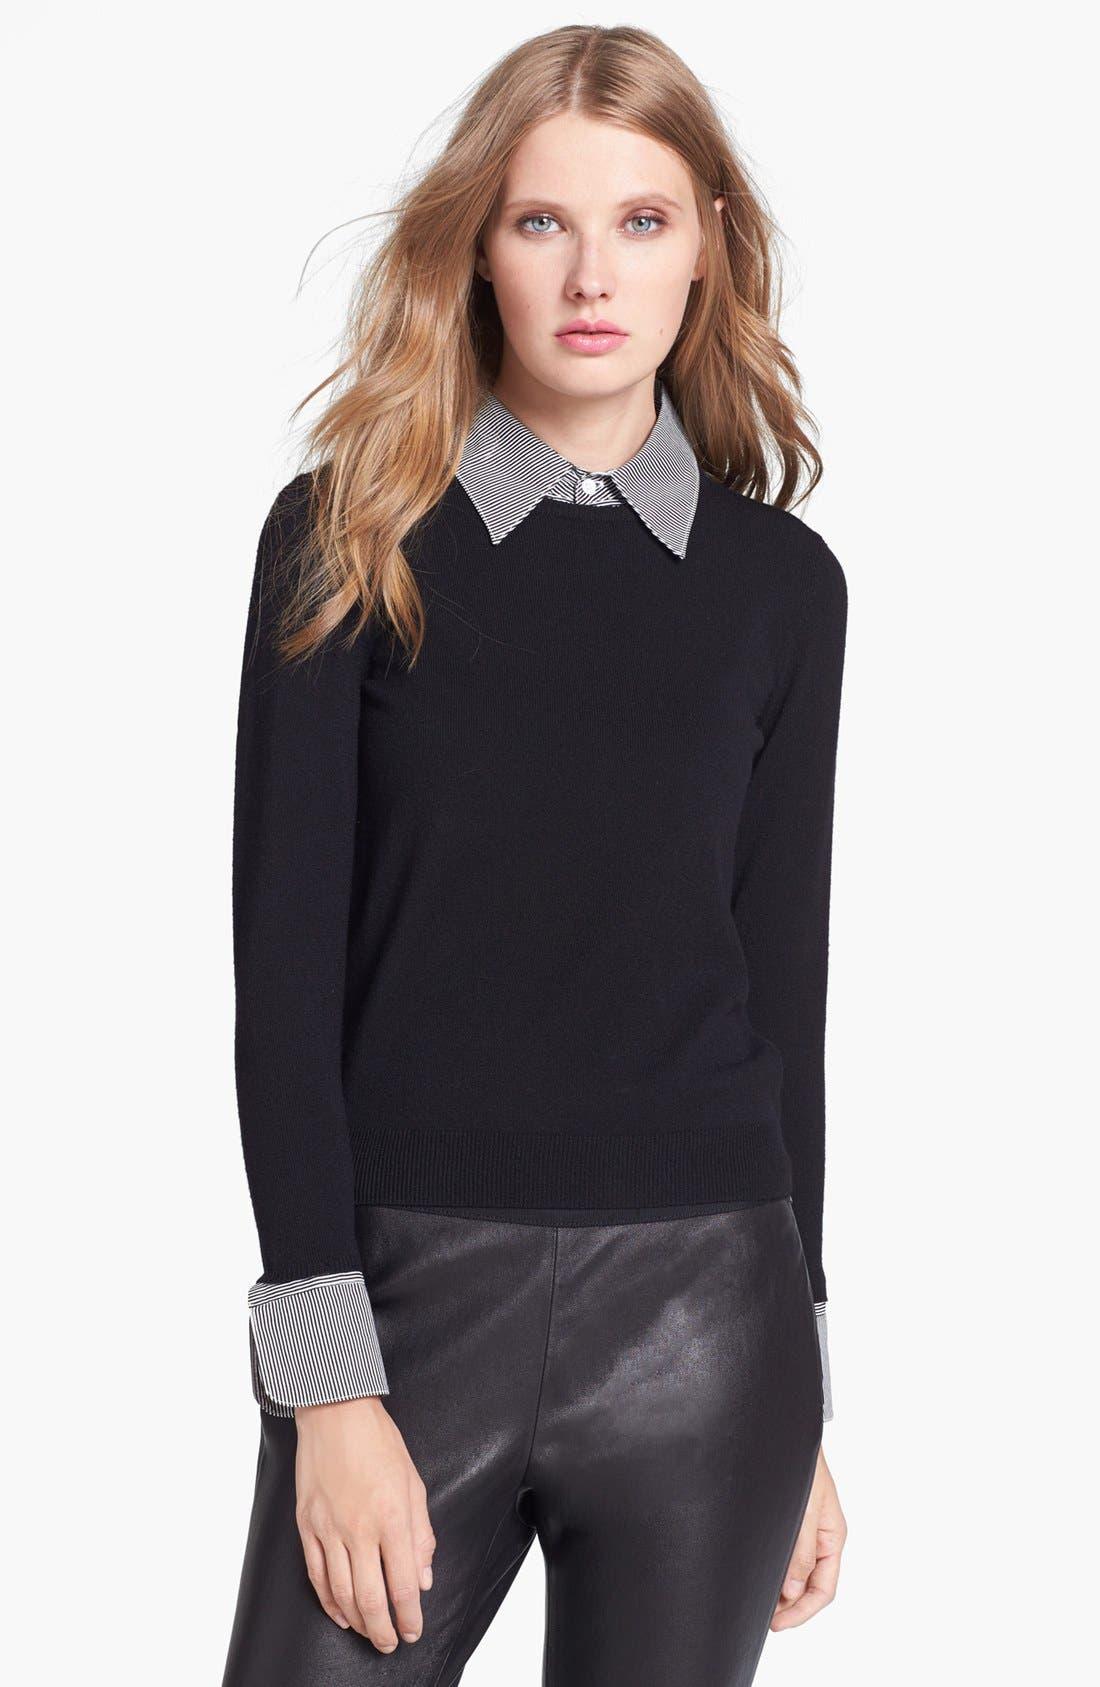 Main Image - Alice + Olivia 'Wiley' Contrast Trim Sweater